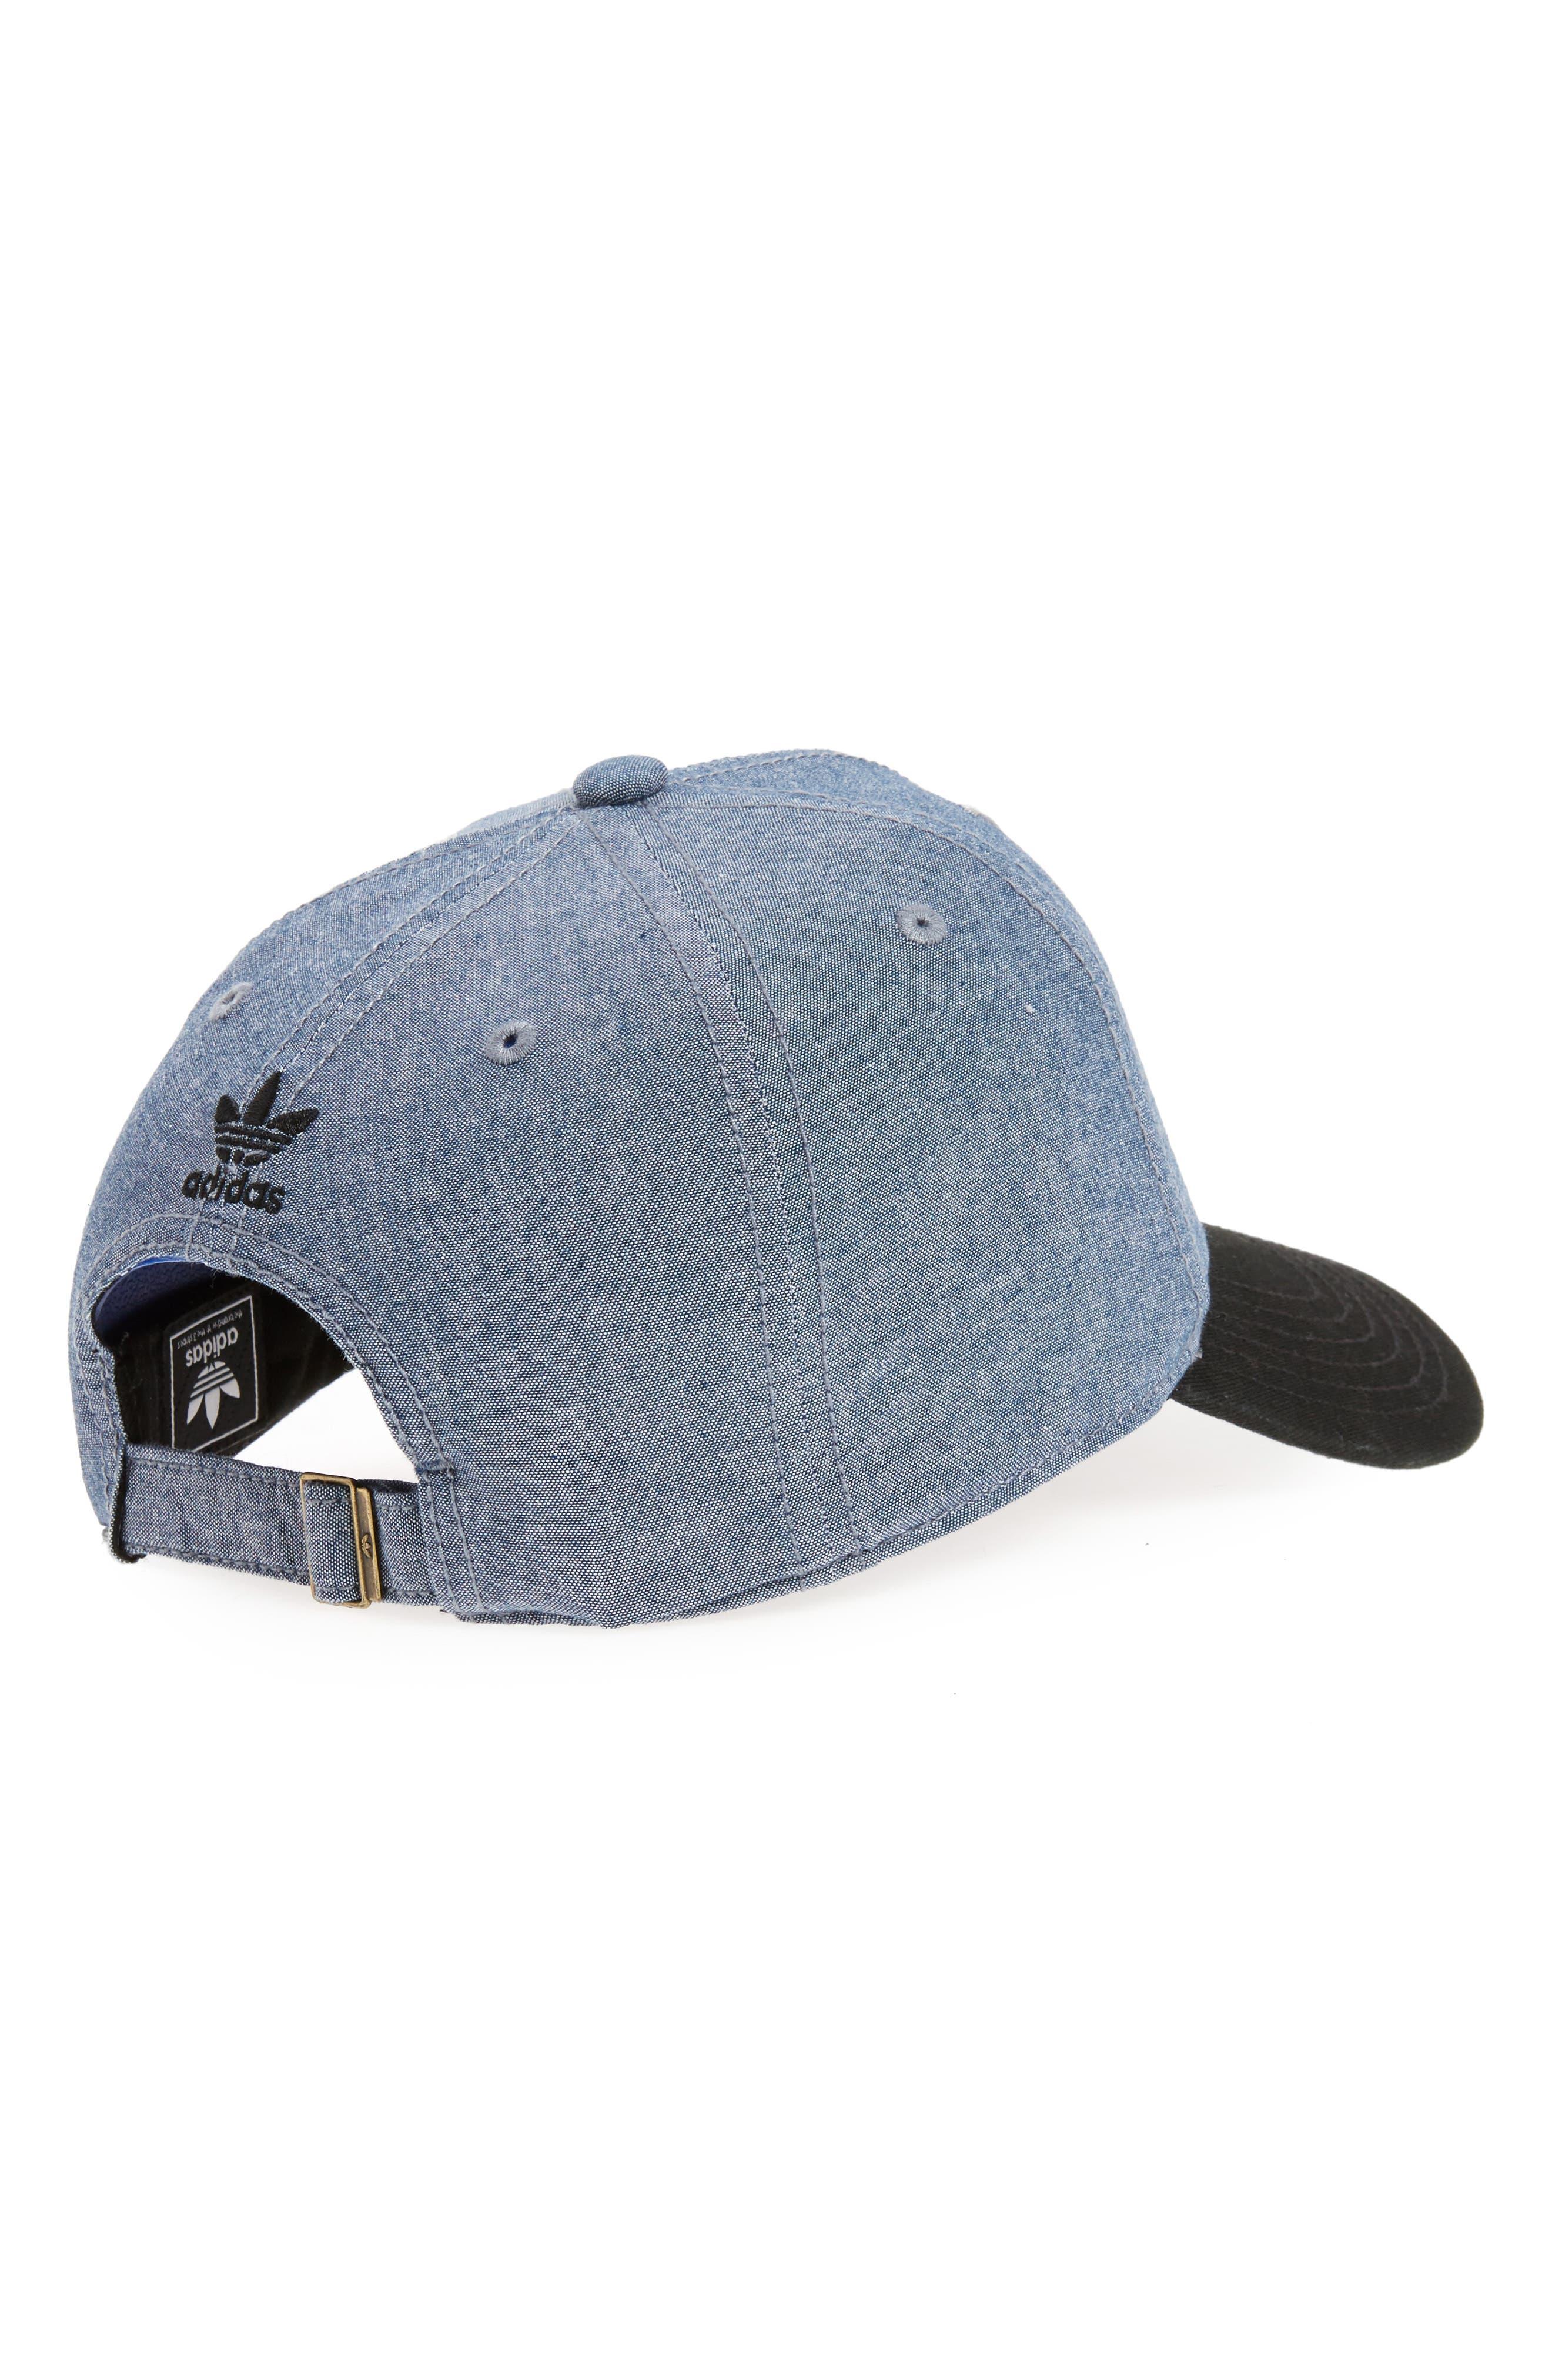 Relaxed Snapback Baseball Cap,                             Alternate thumbnail 2, color,                             Medium Blue